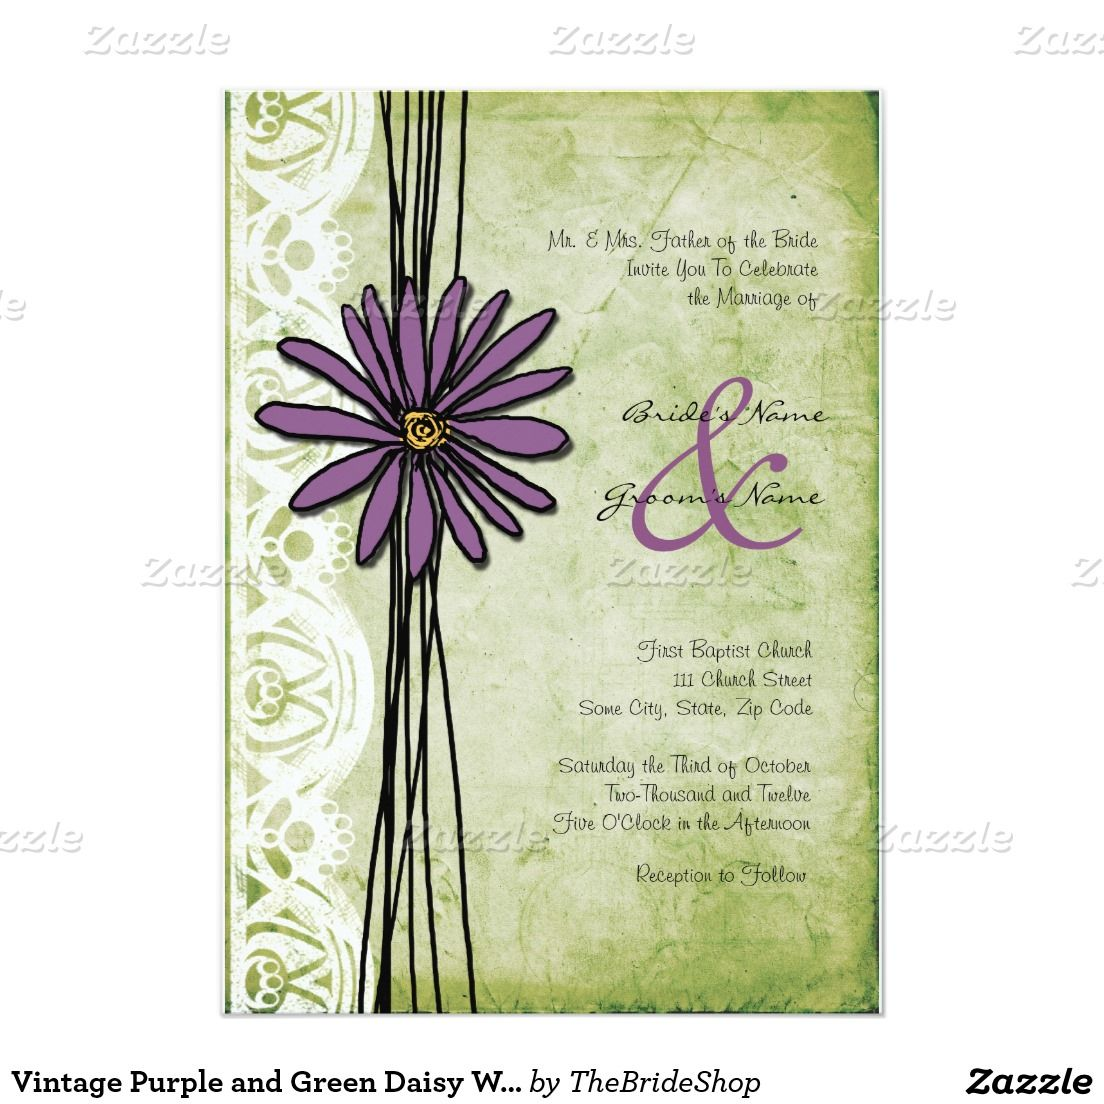 Vintage Purple and Green Daisy Wedding Invitations   Daisy wedding ...